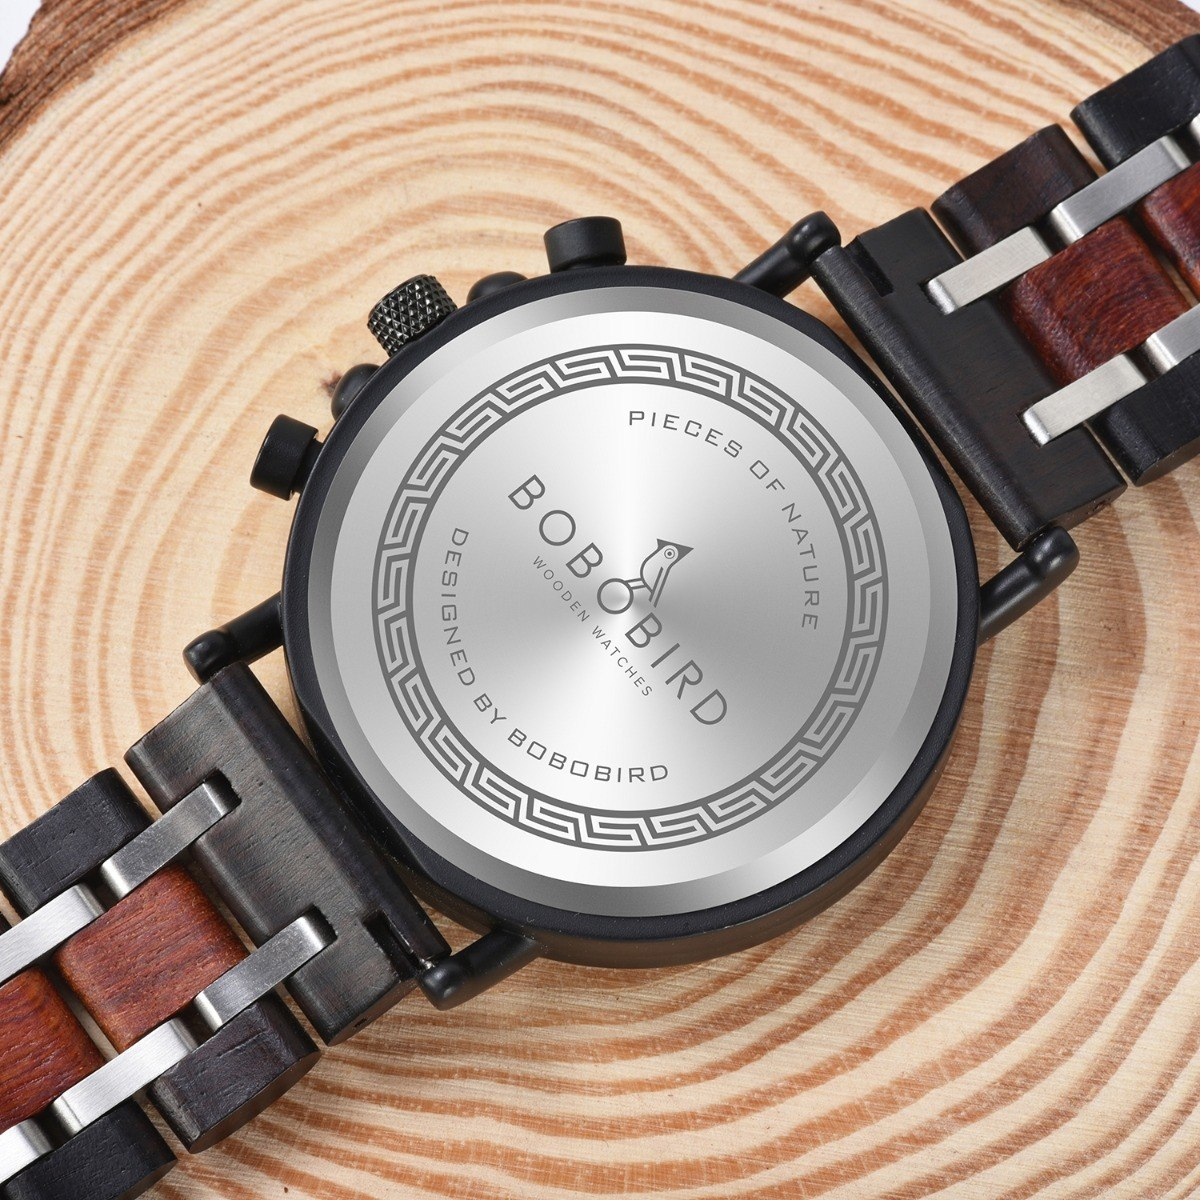 Relógio Bobo Bird de Madeira, Aço Inox Mabea, Analógico